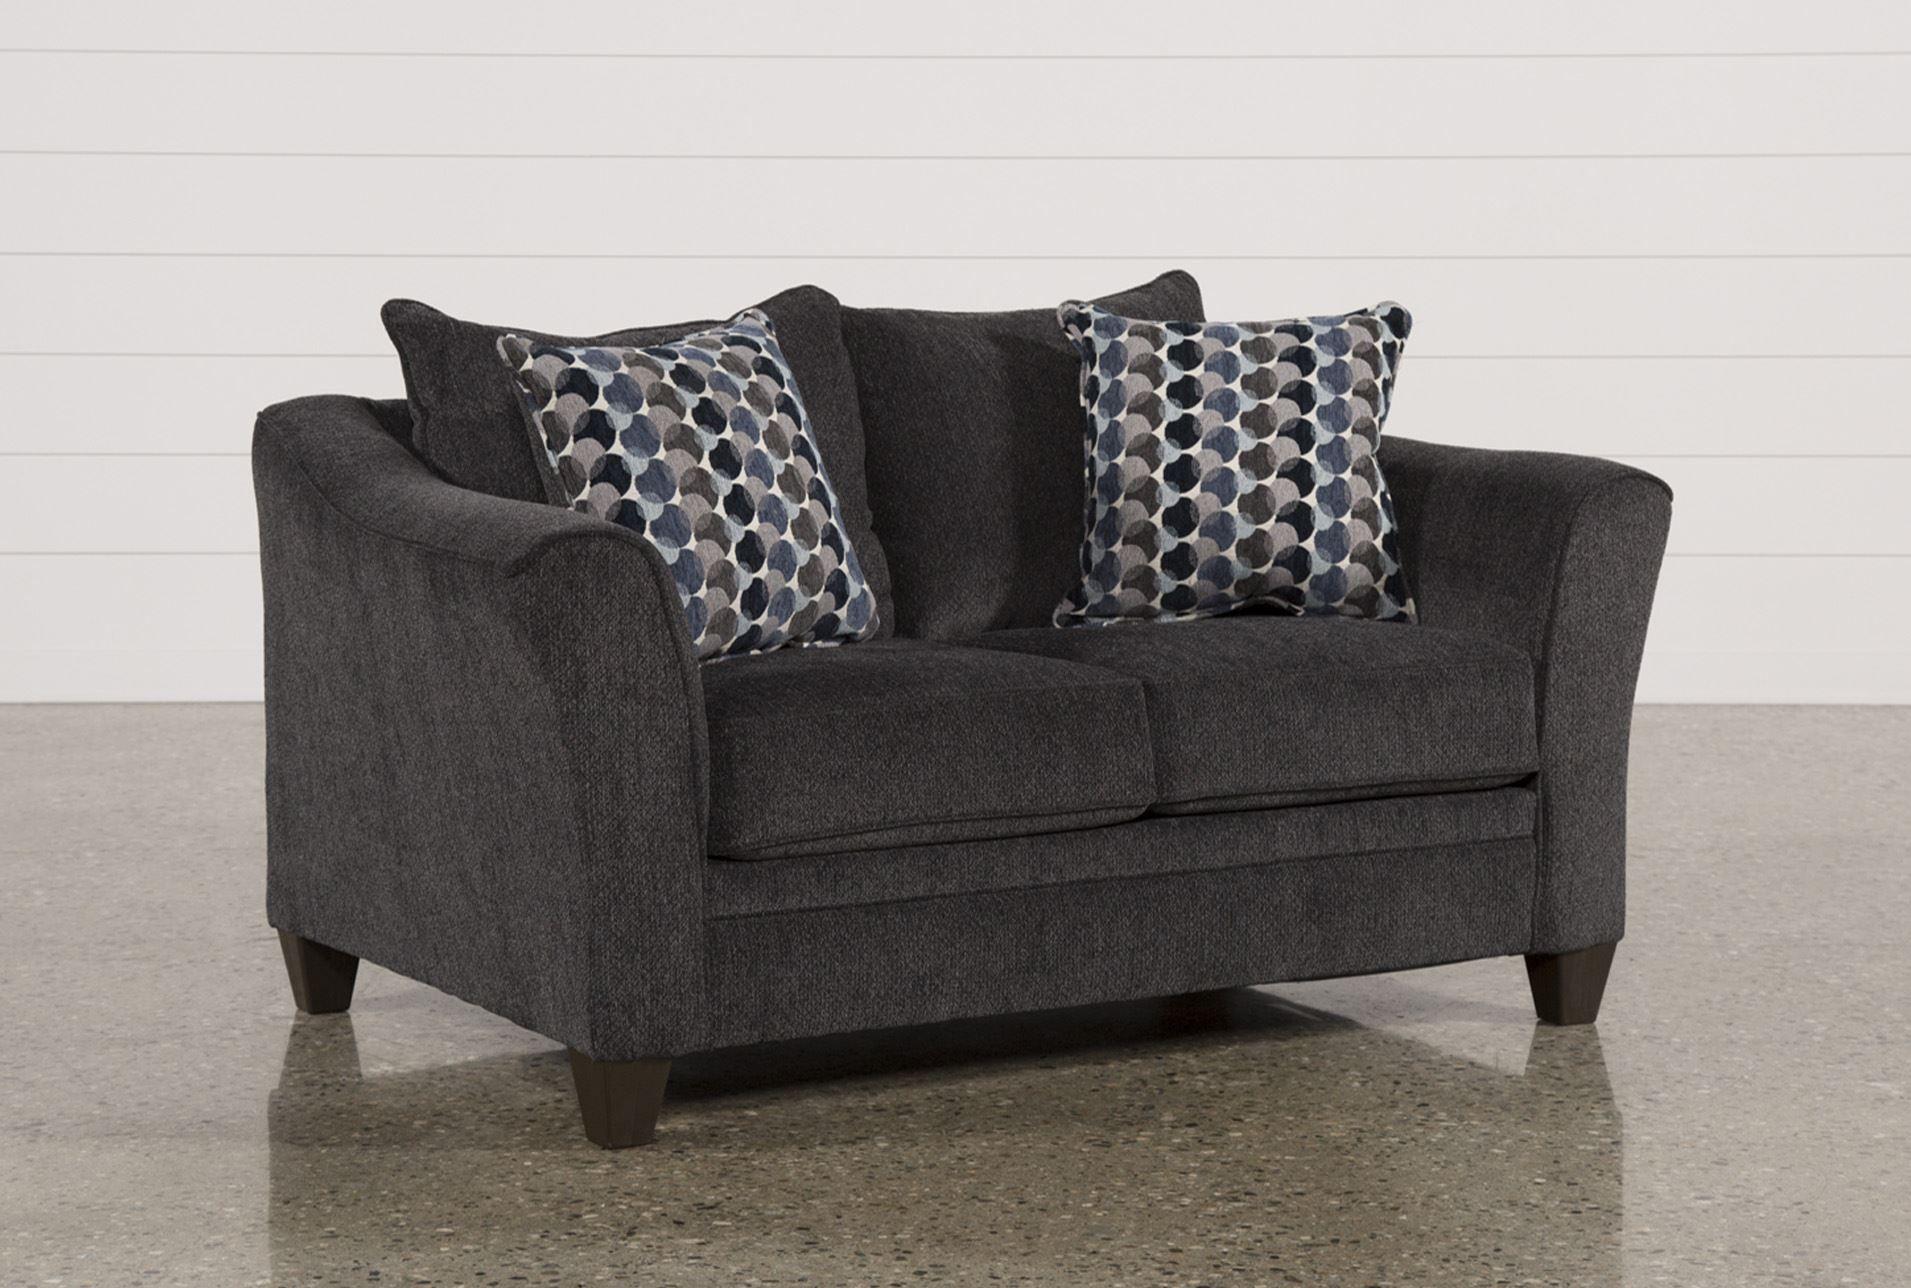 Astonishing Koltin Slate Loveseat Signature Palmores Pins Sofa Ibusinesslaw Wood Chair Design Ideas Ibusinesslaworg